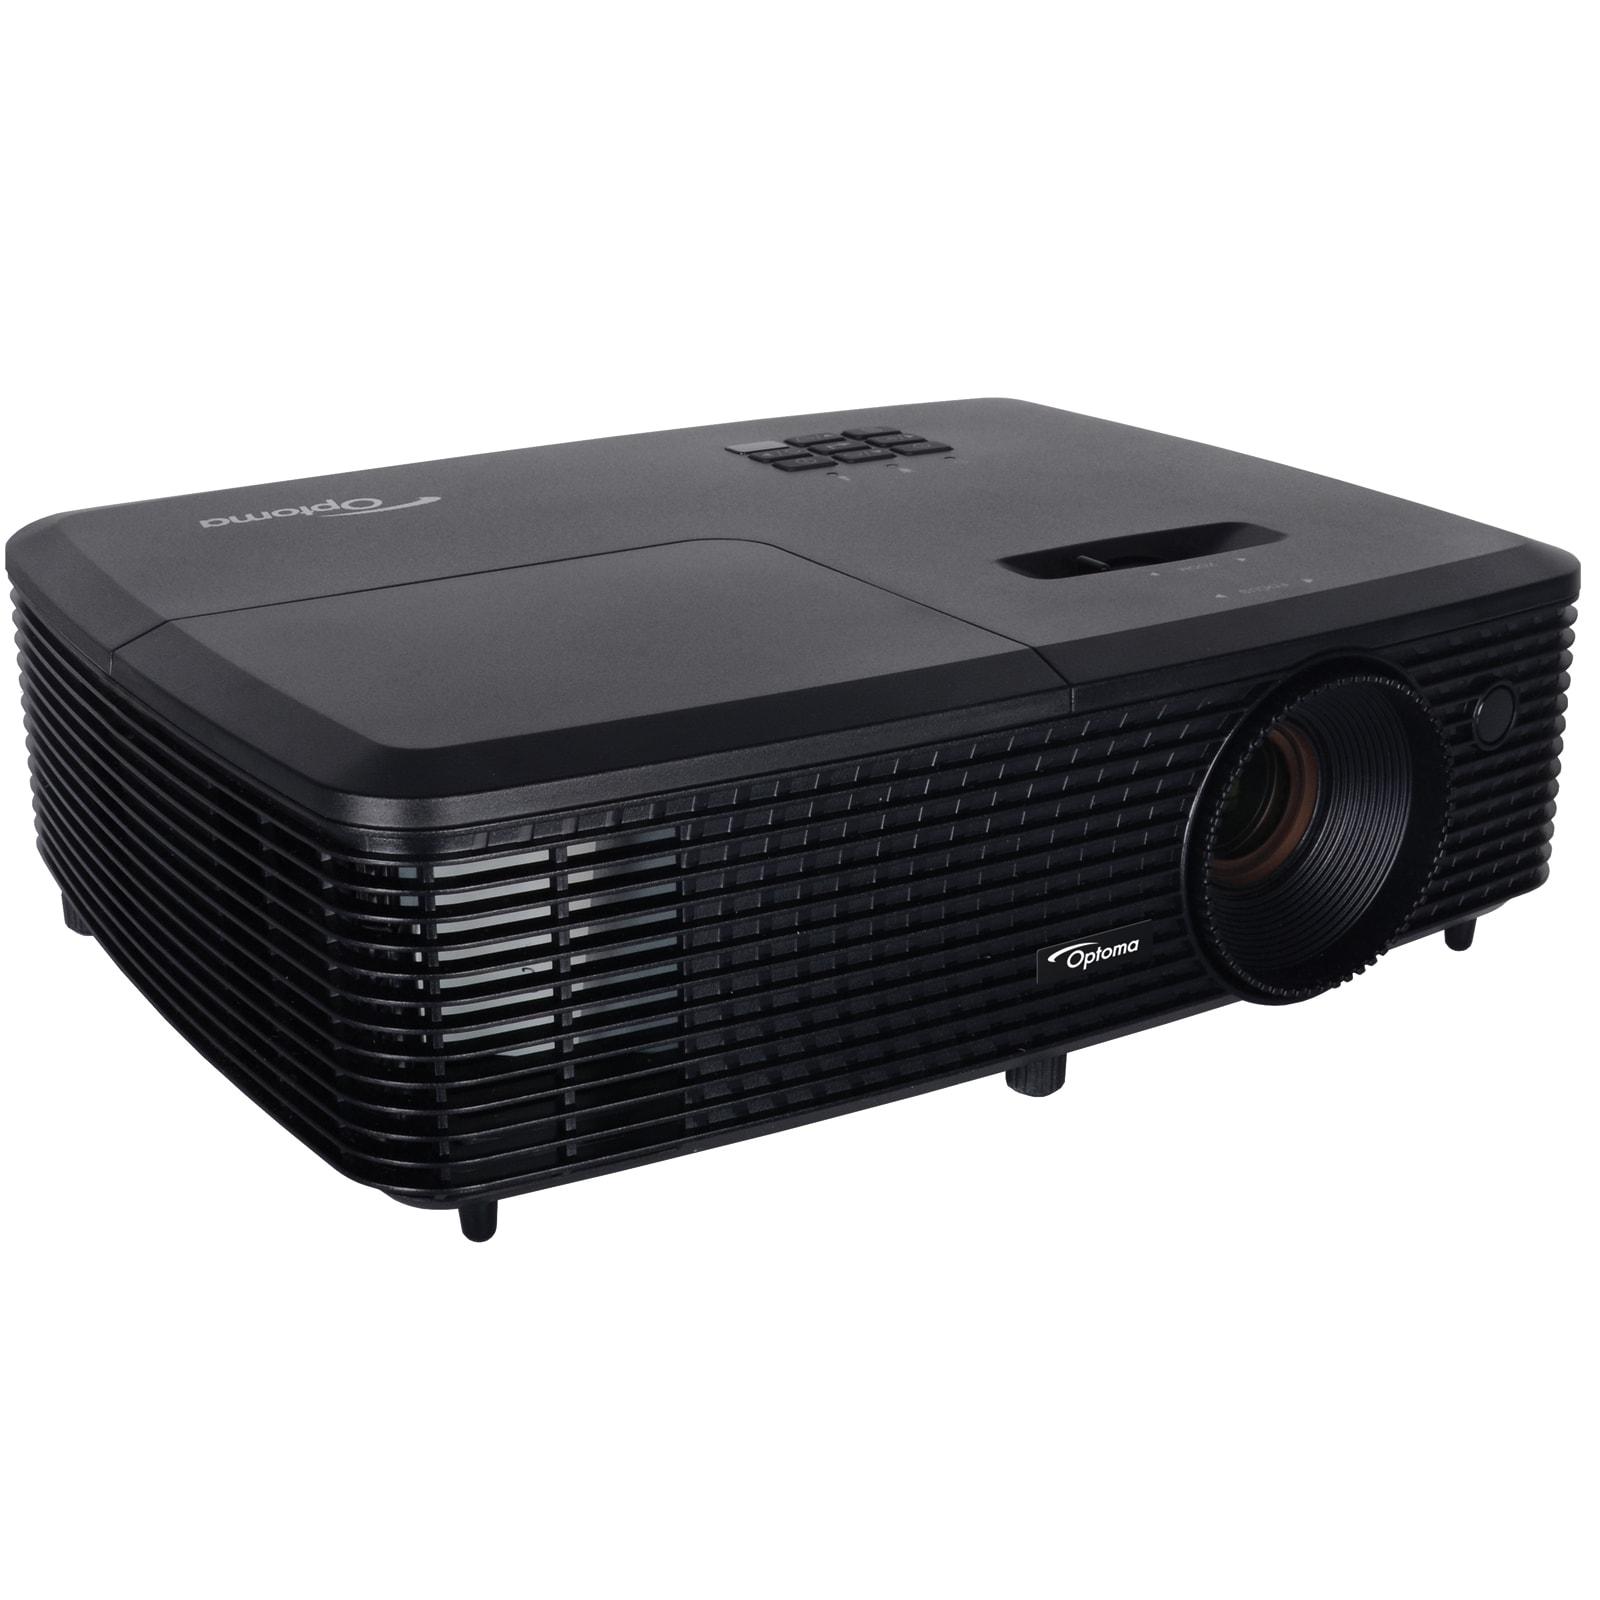 Optoma X340 - Vidéoprojecteur Optoma - Cybertek.fr - 4